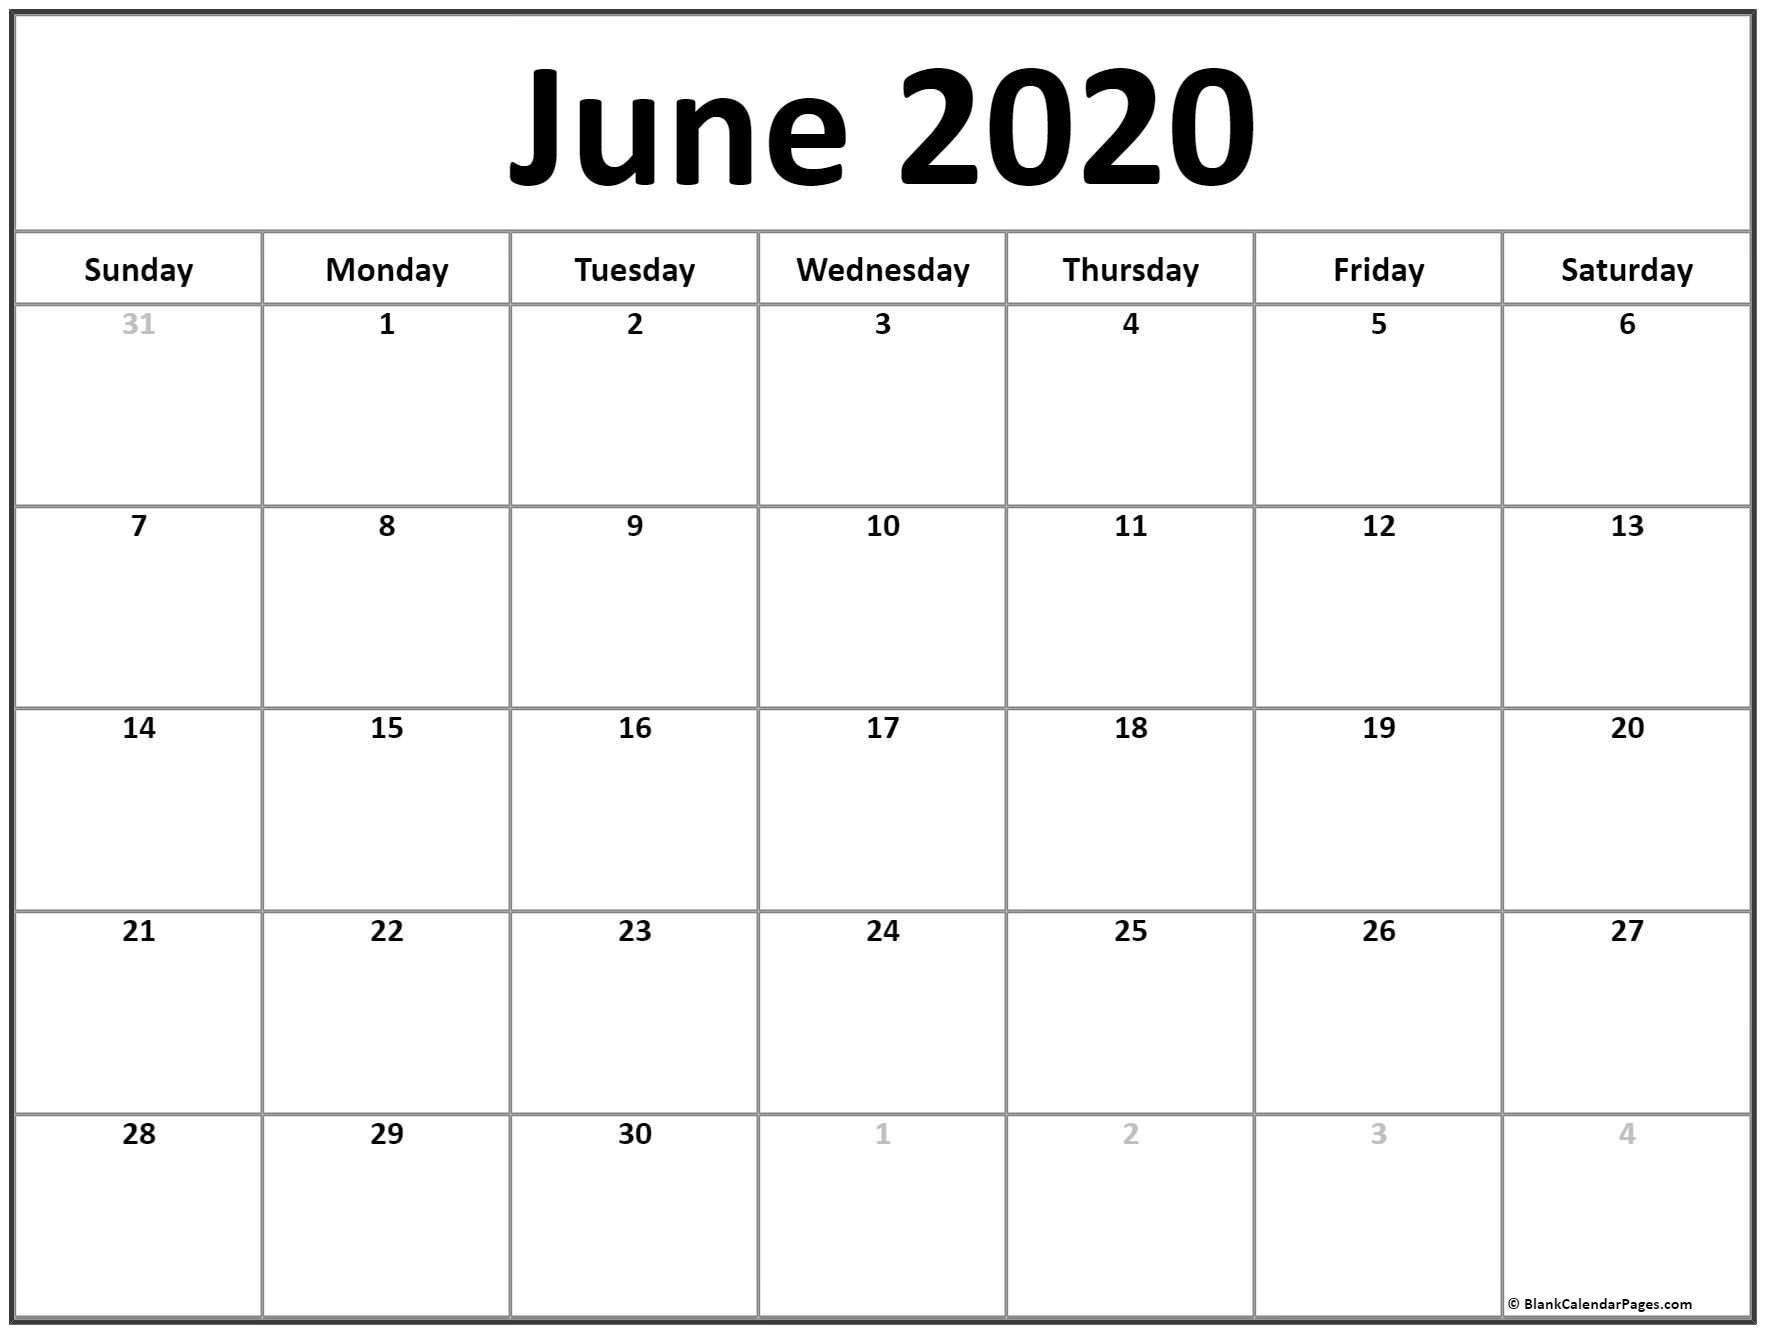 June 2020 Calendar   Free Printable Monthly Calendars-Printable Calendar 2020 Monthly June And July